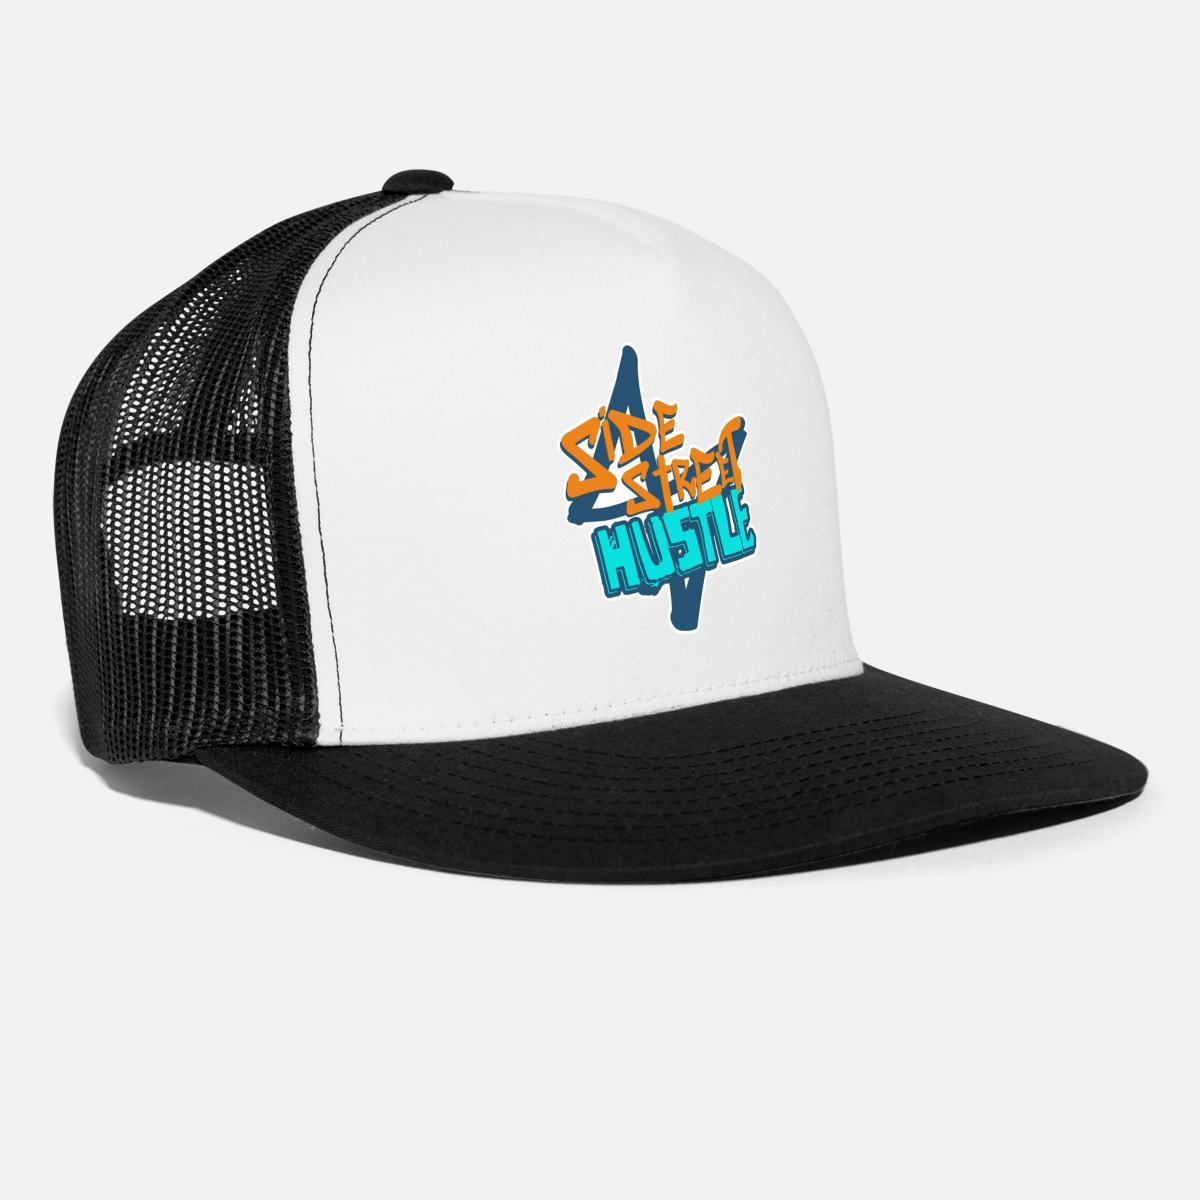 4dd48c854de Graffiti rap sprayer painting hip hop streetwear trucker cap spreadshirt  jpg 1200x1200 Painted hat streetwear